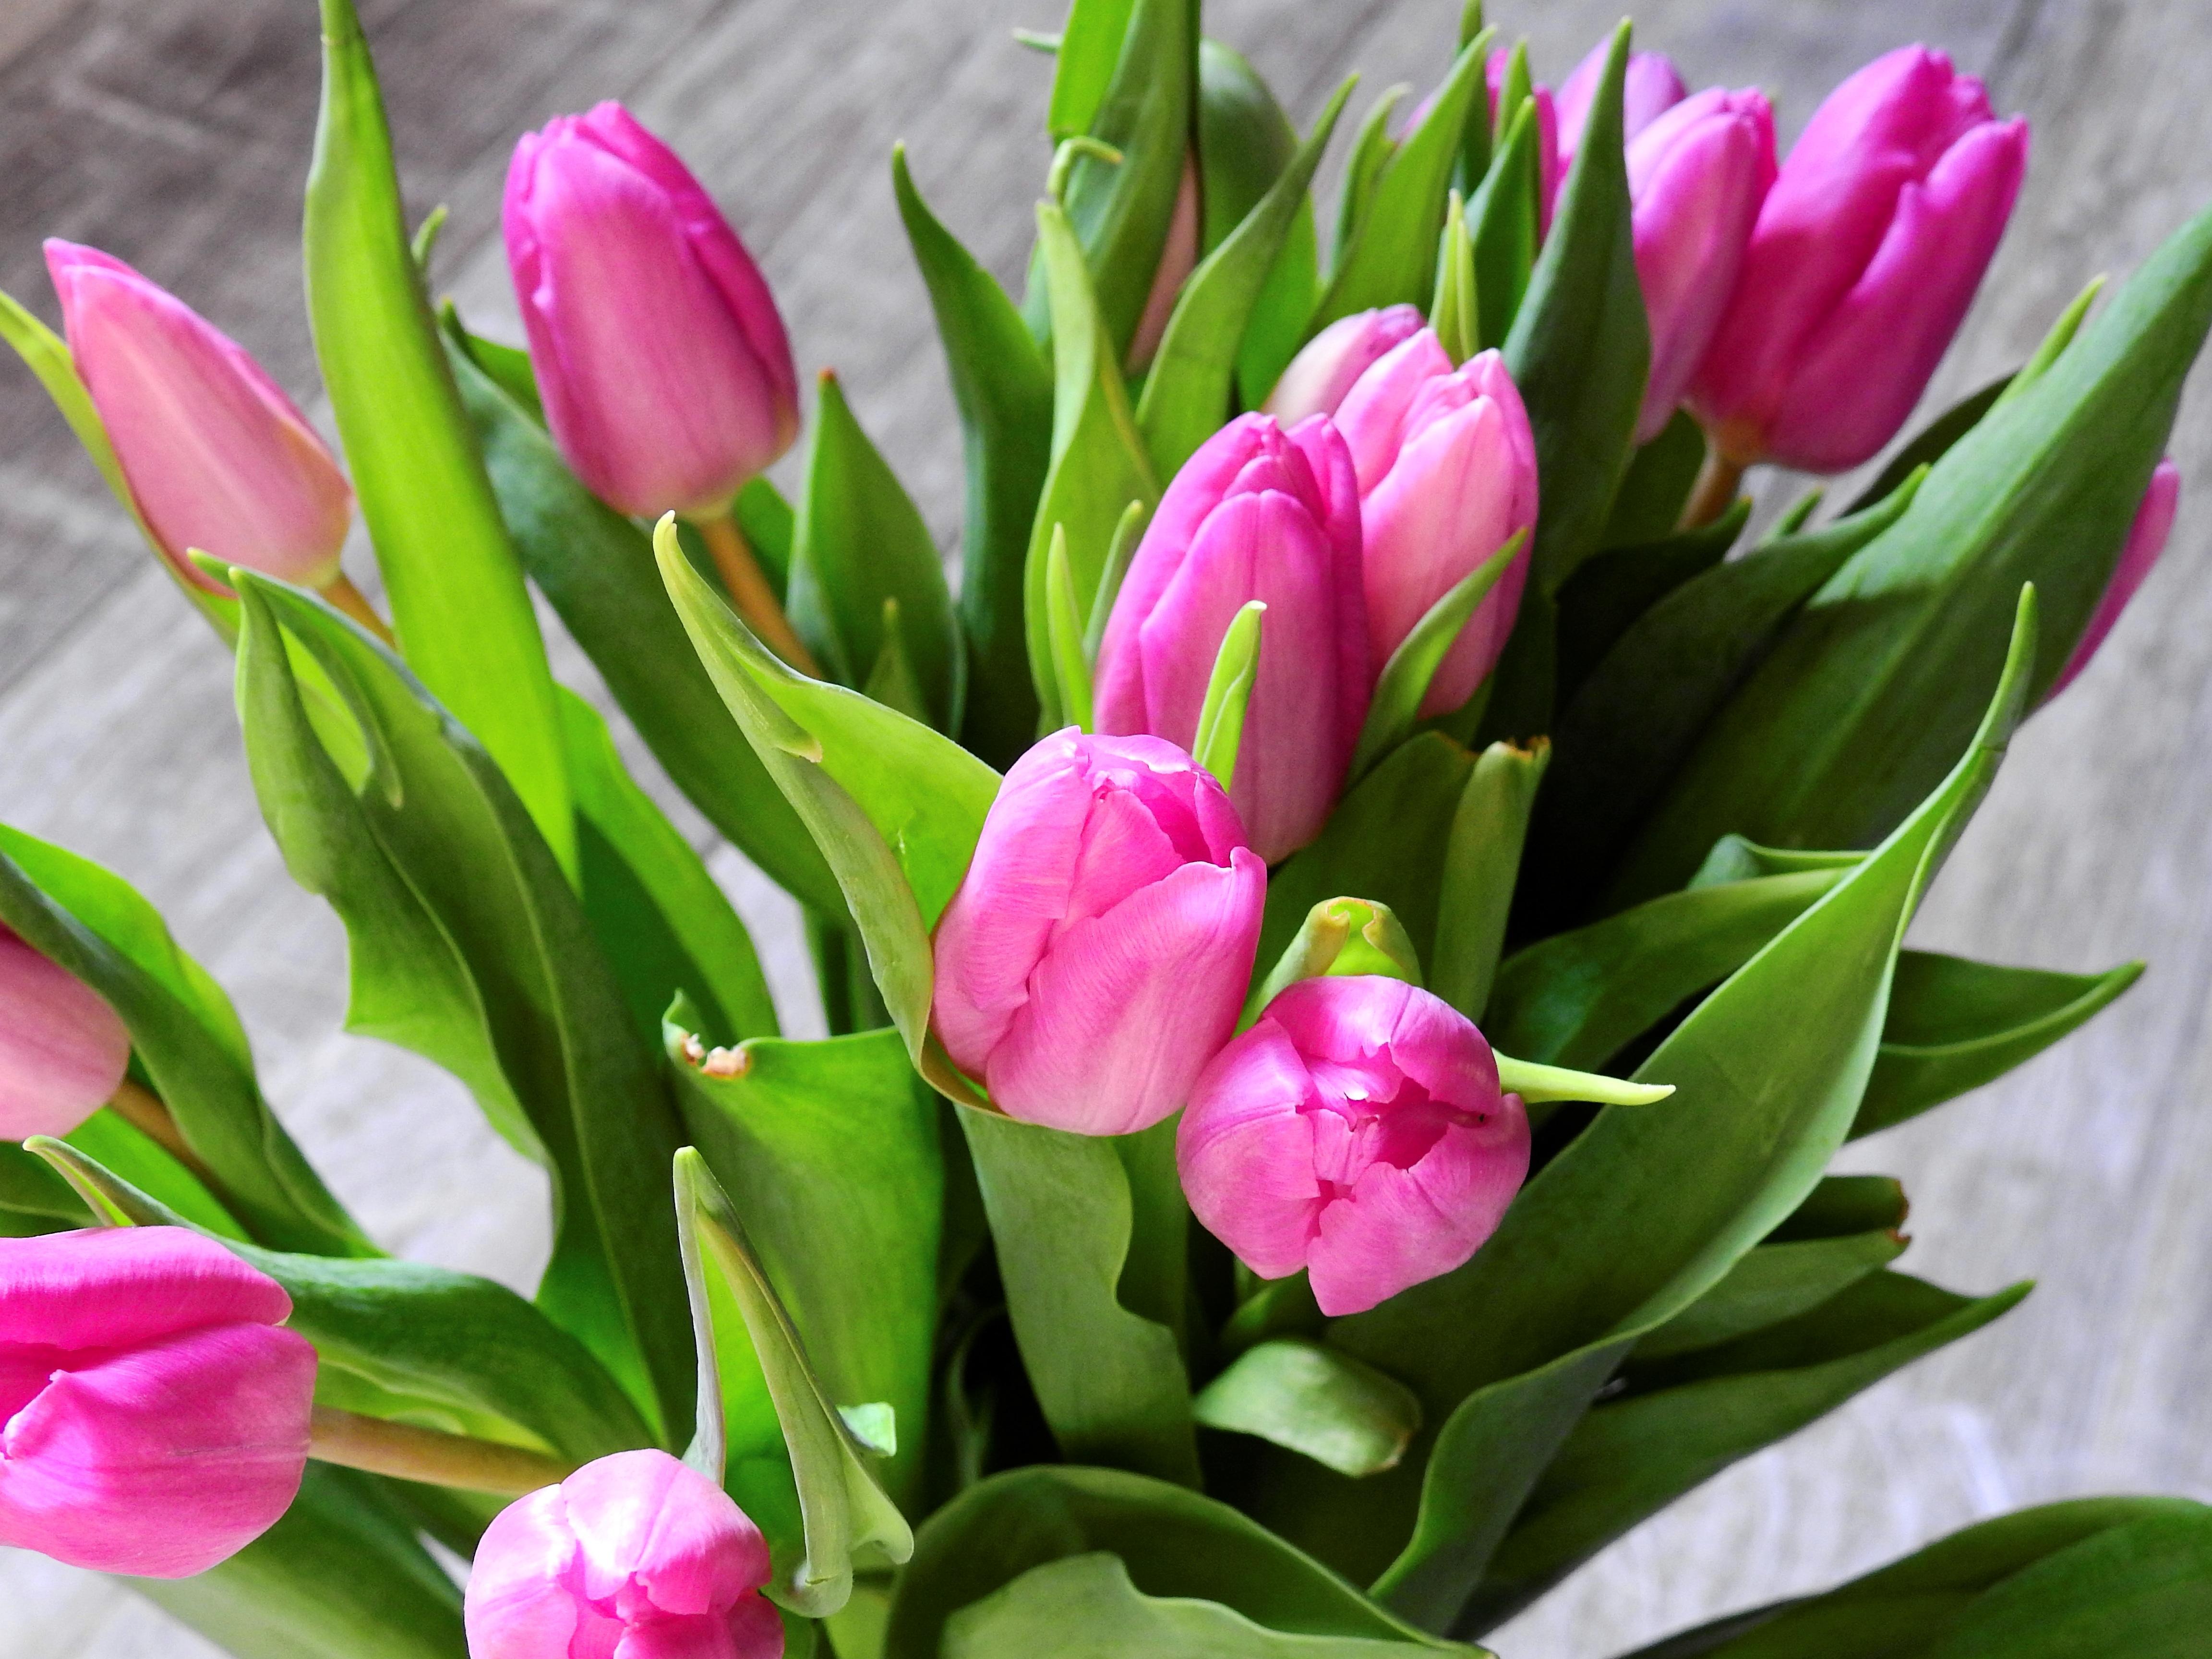 kostenlose foto bl hen blume bl tenblatt tulpe. Black Bedroom Furniture Sets. Home Design Ideas